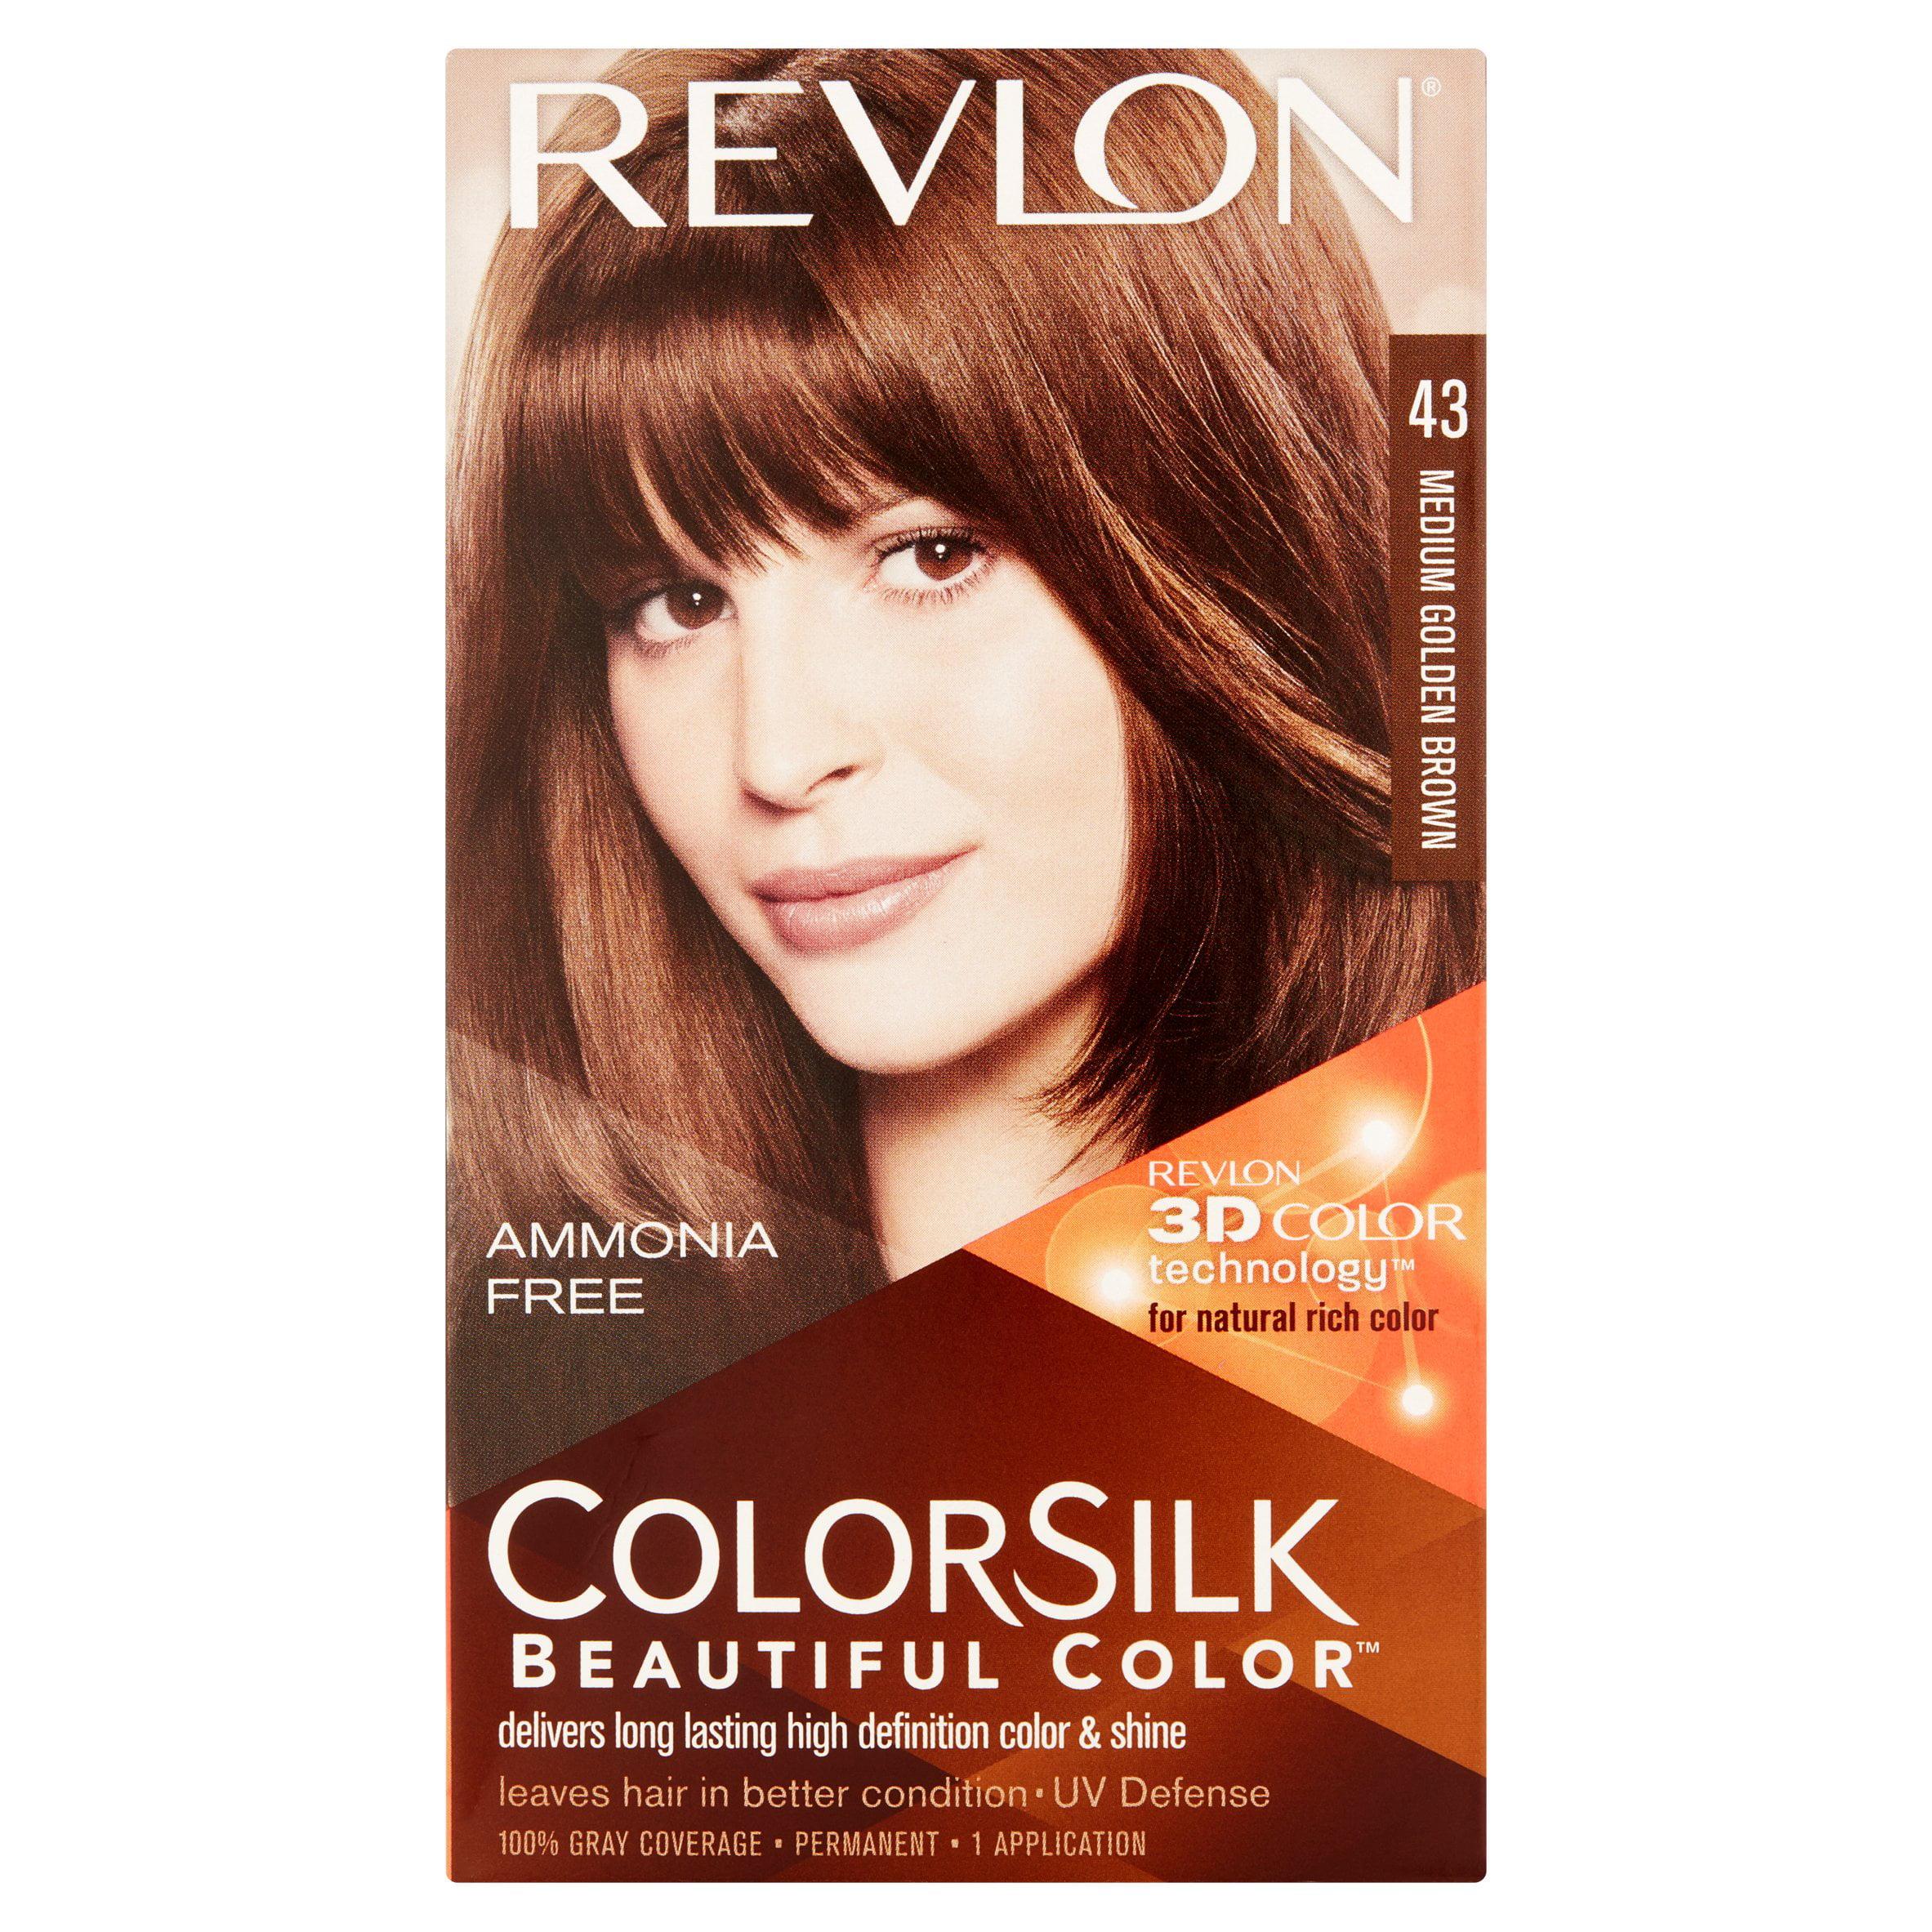 Revlon174 Colorsilk Beautiful Color8482 Permanent Liquid